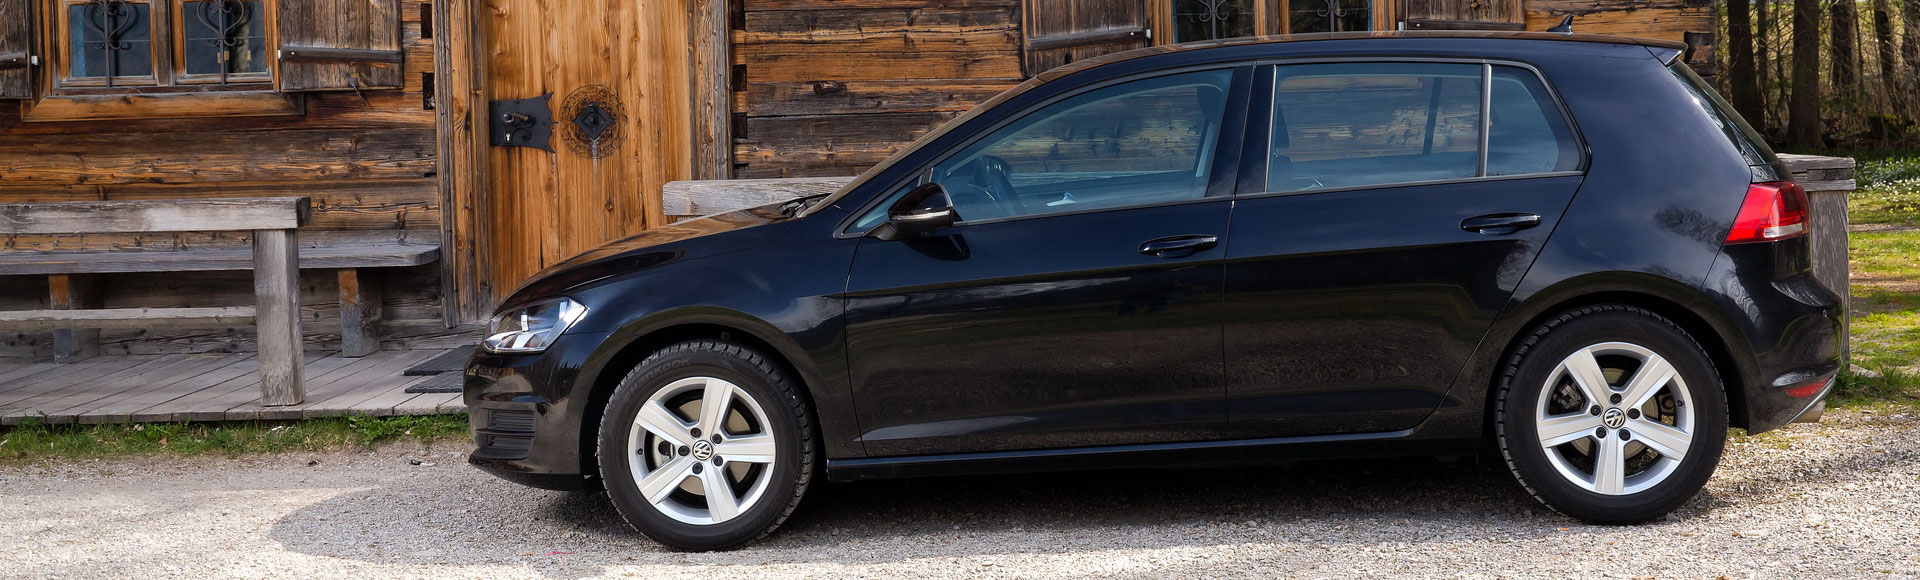 VW Golf 2013 Spring 30629